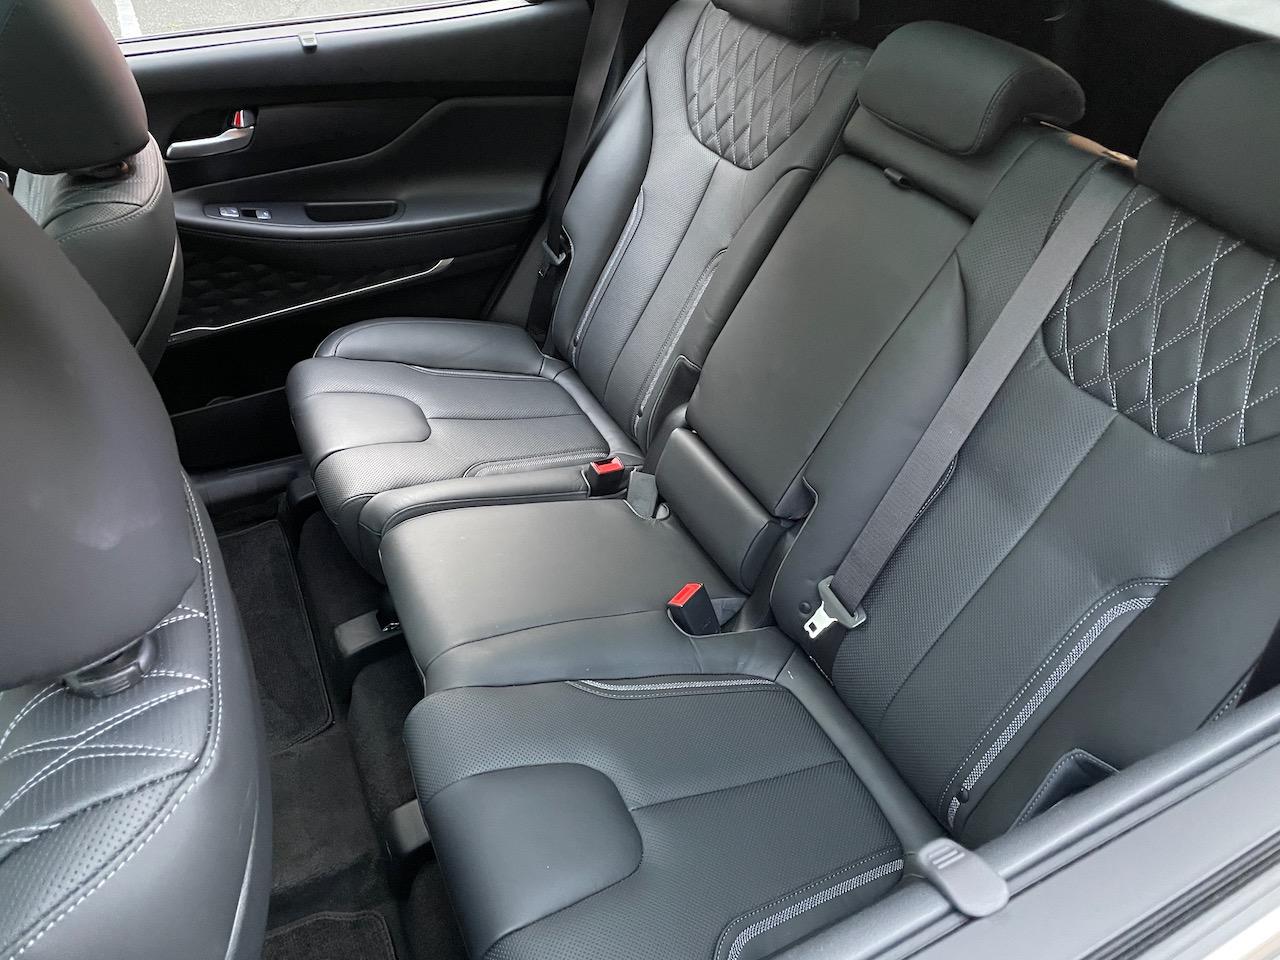 2021 Hyundai Santa Fe 2.5T Calligraphy back seat